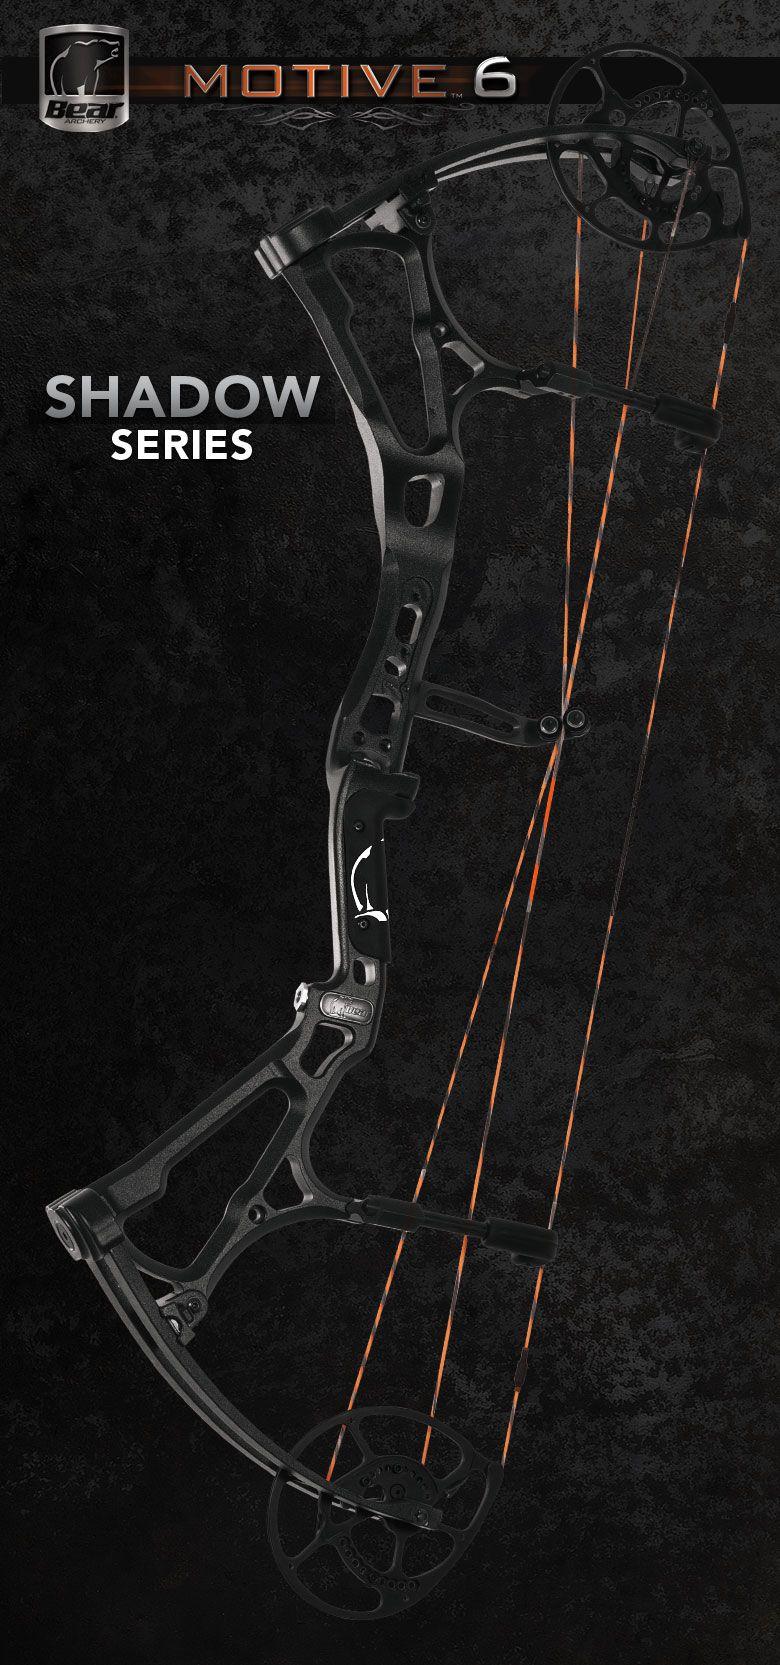 Bear Archery Iphone Wallpaper